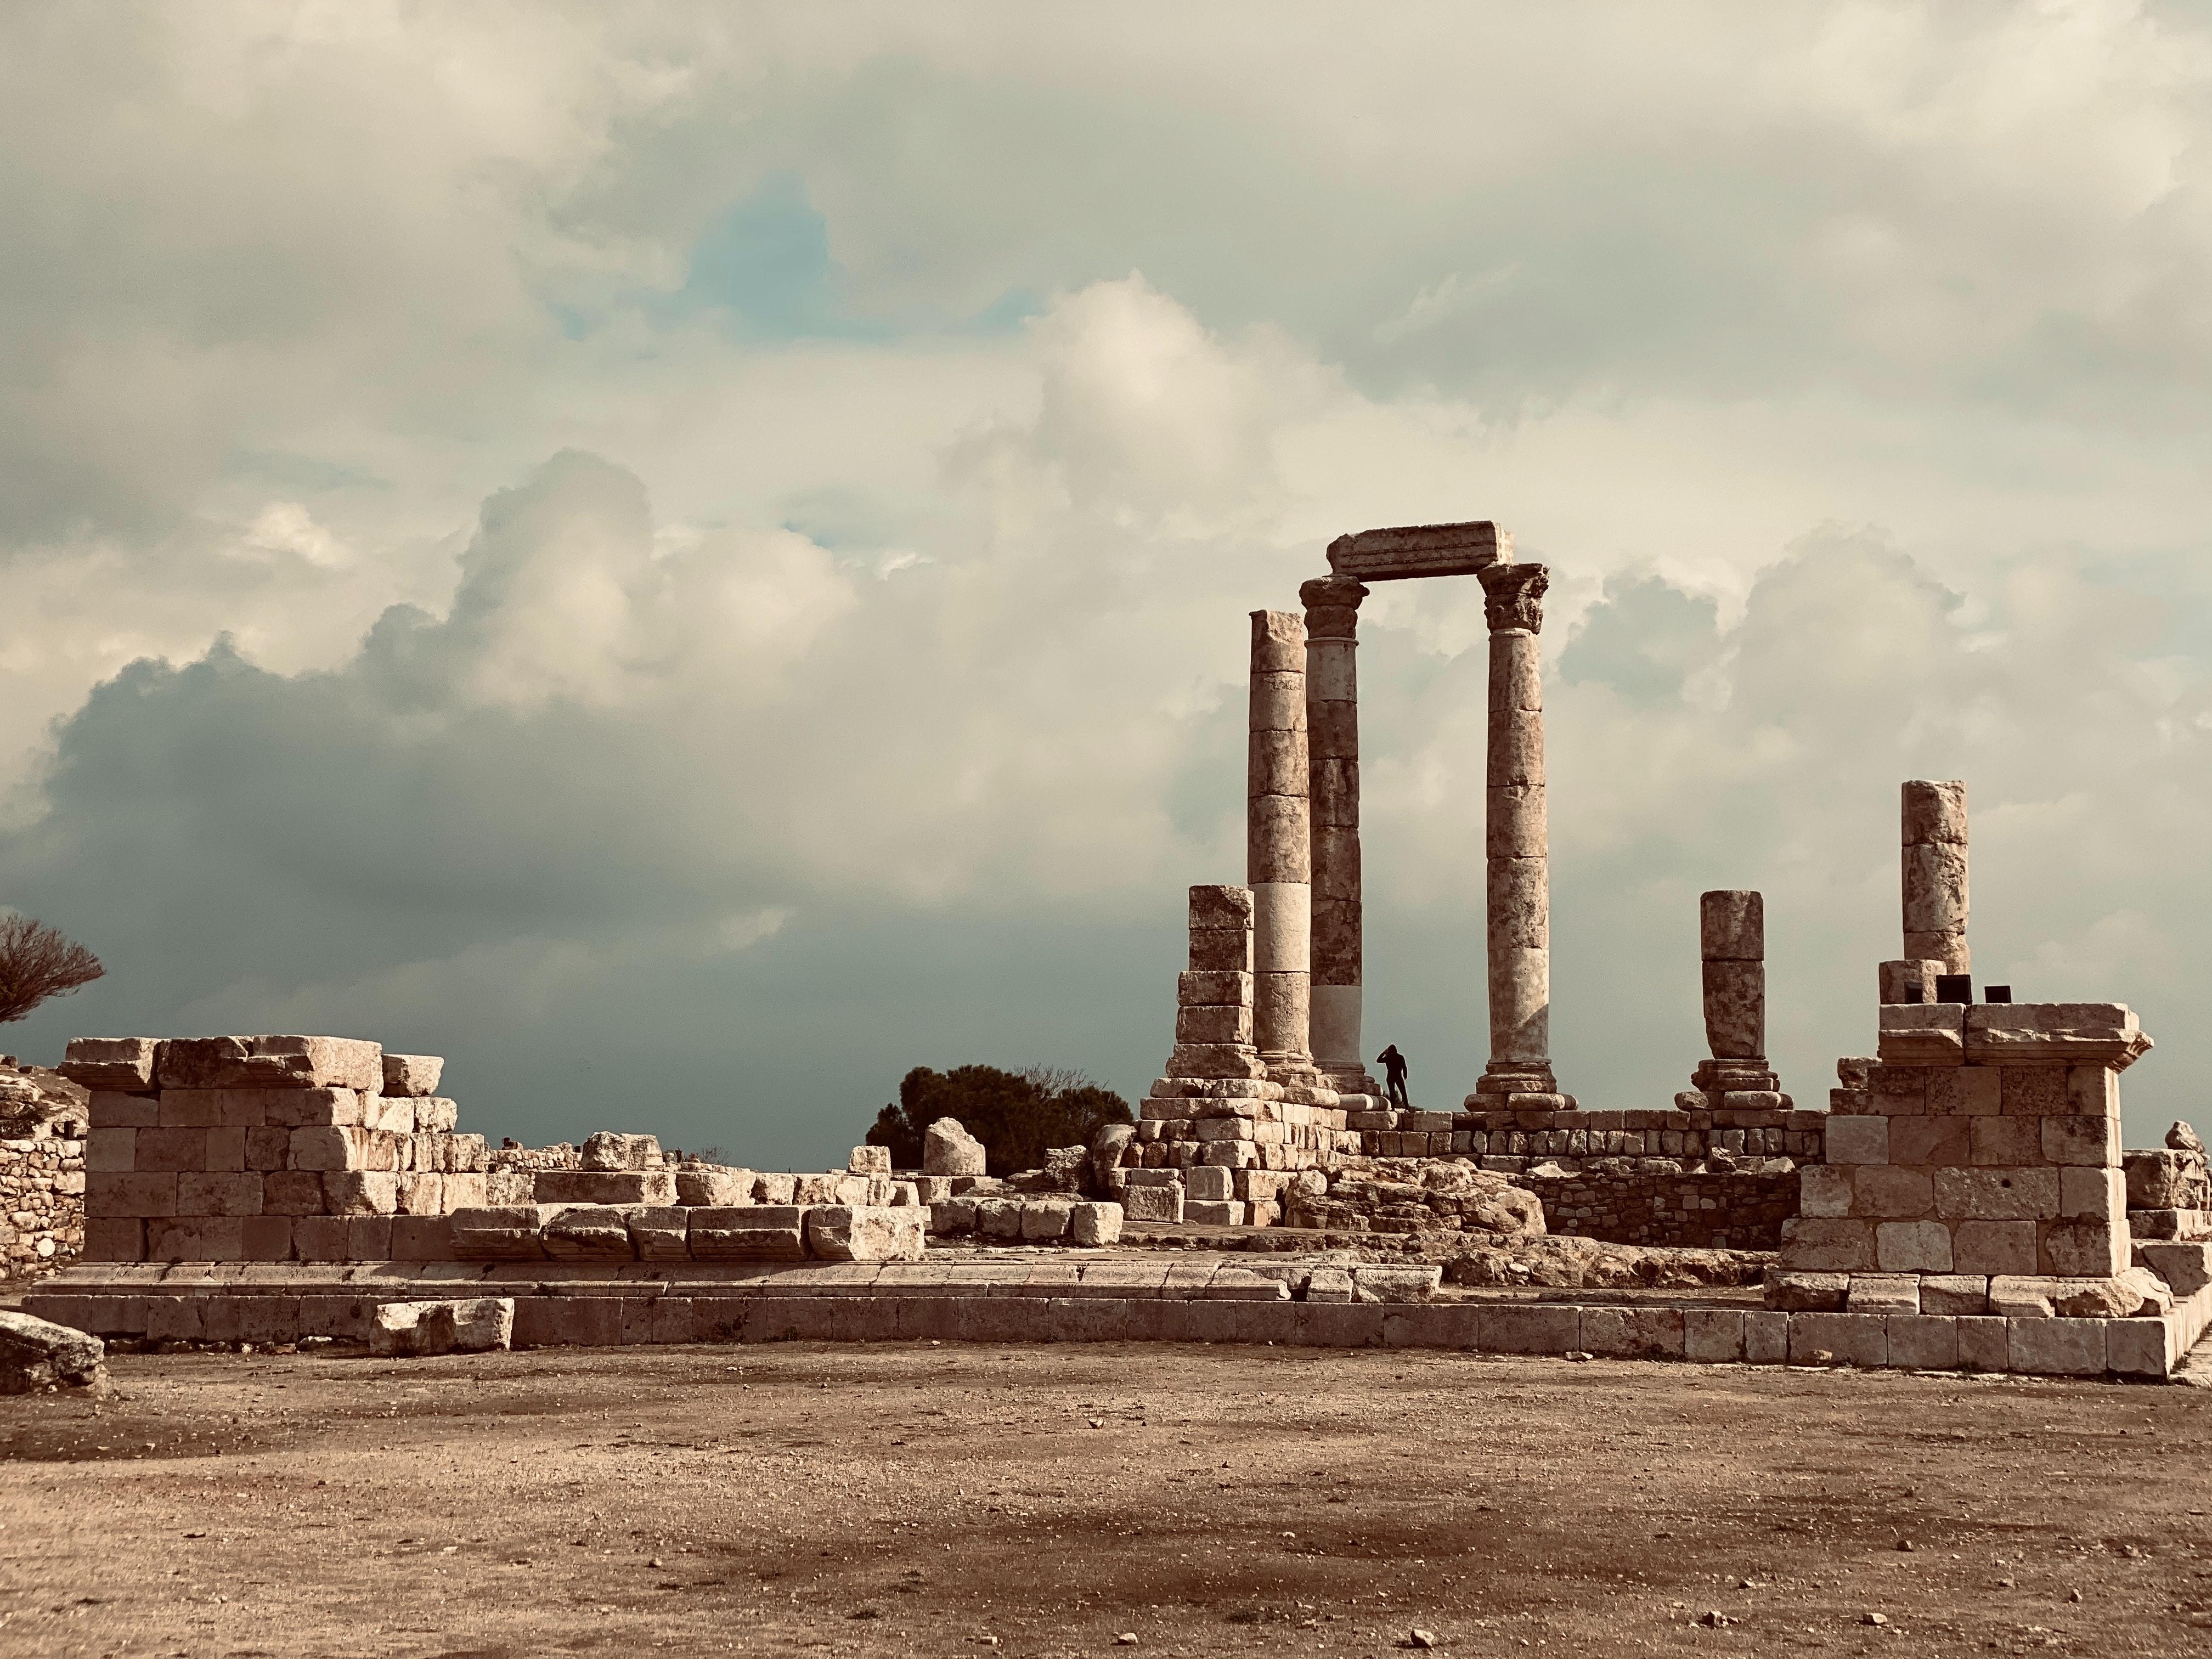 Witness the roman ruins of Citadel